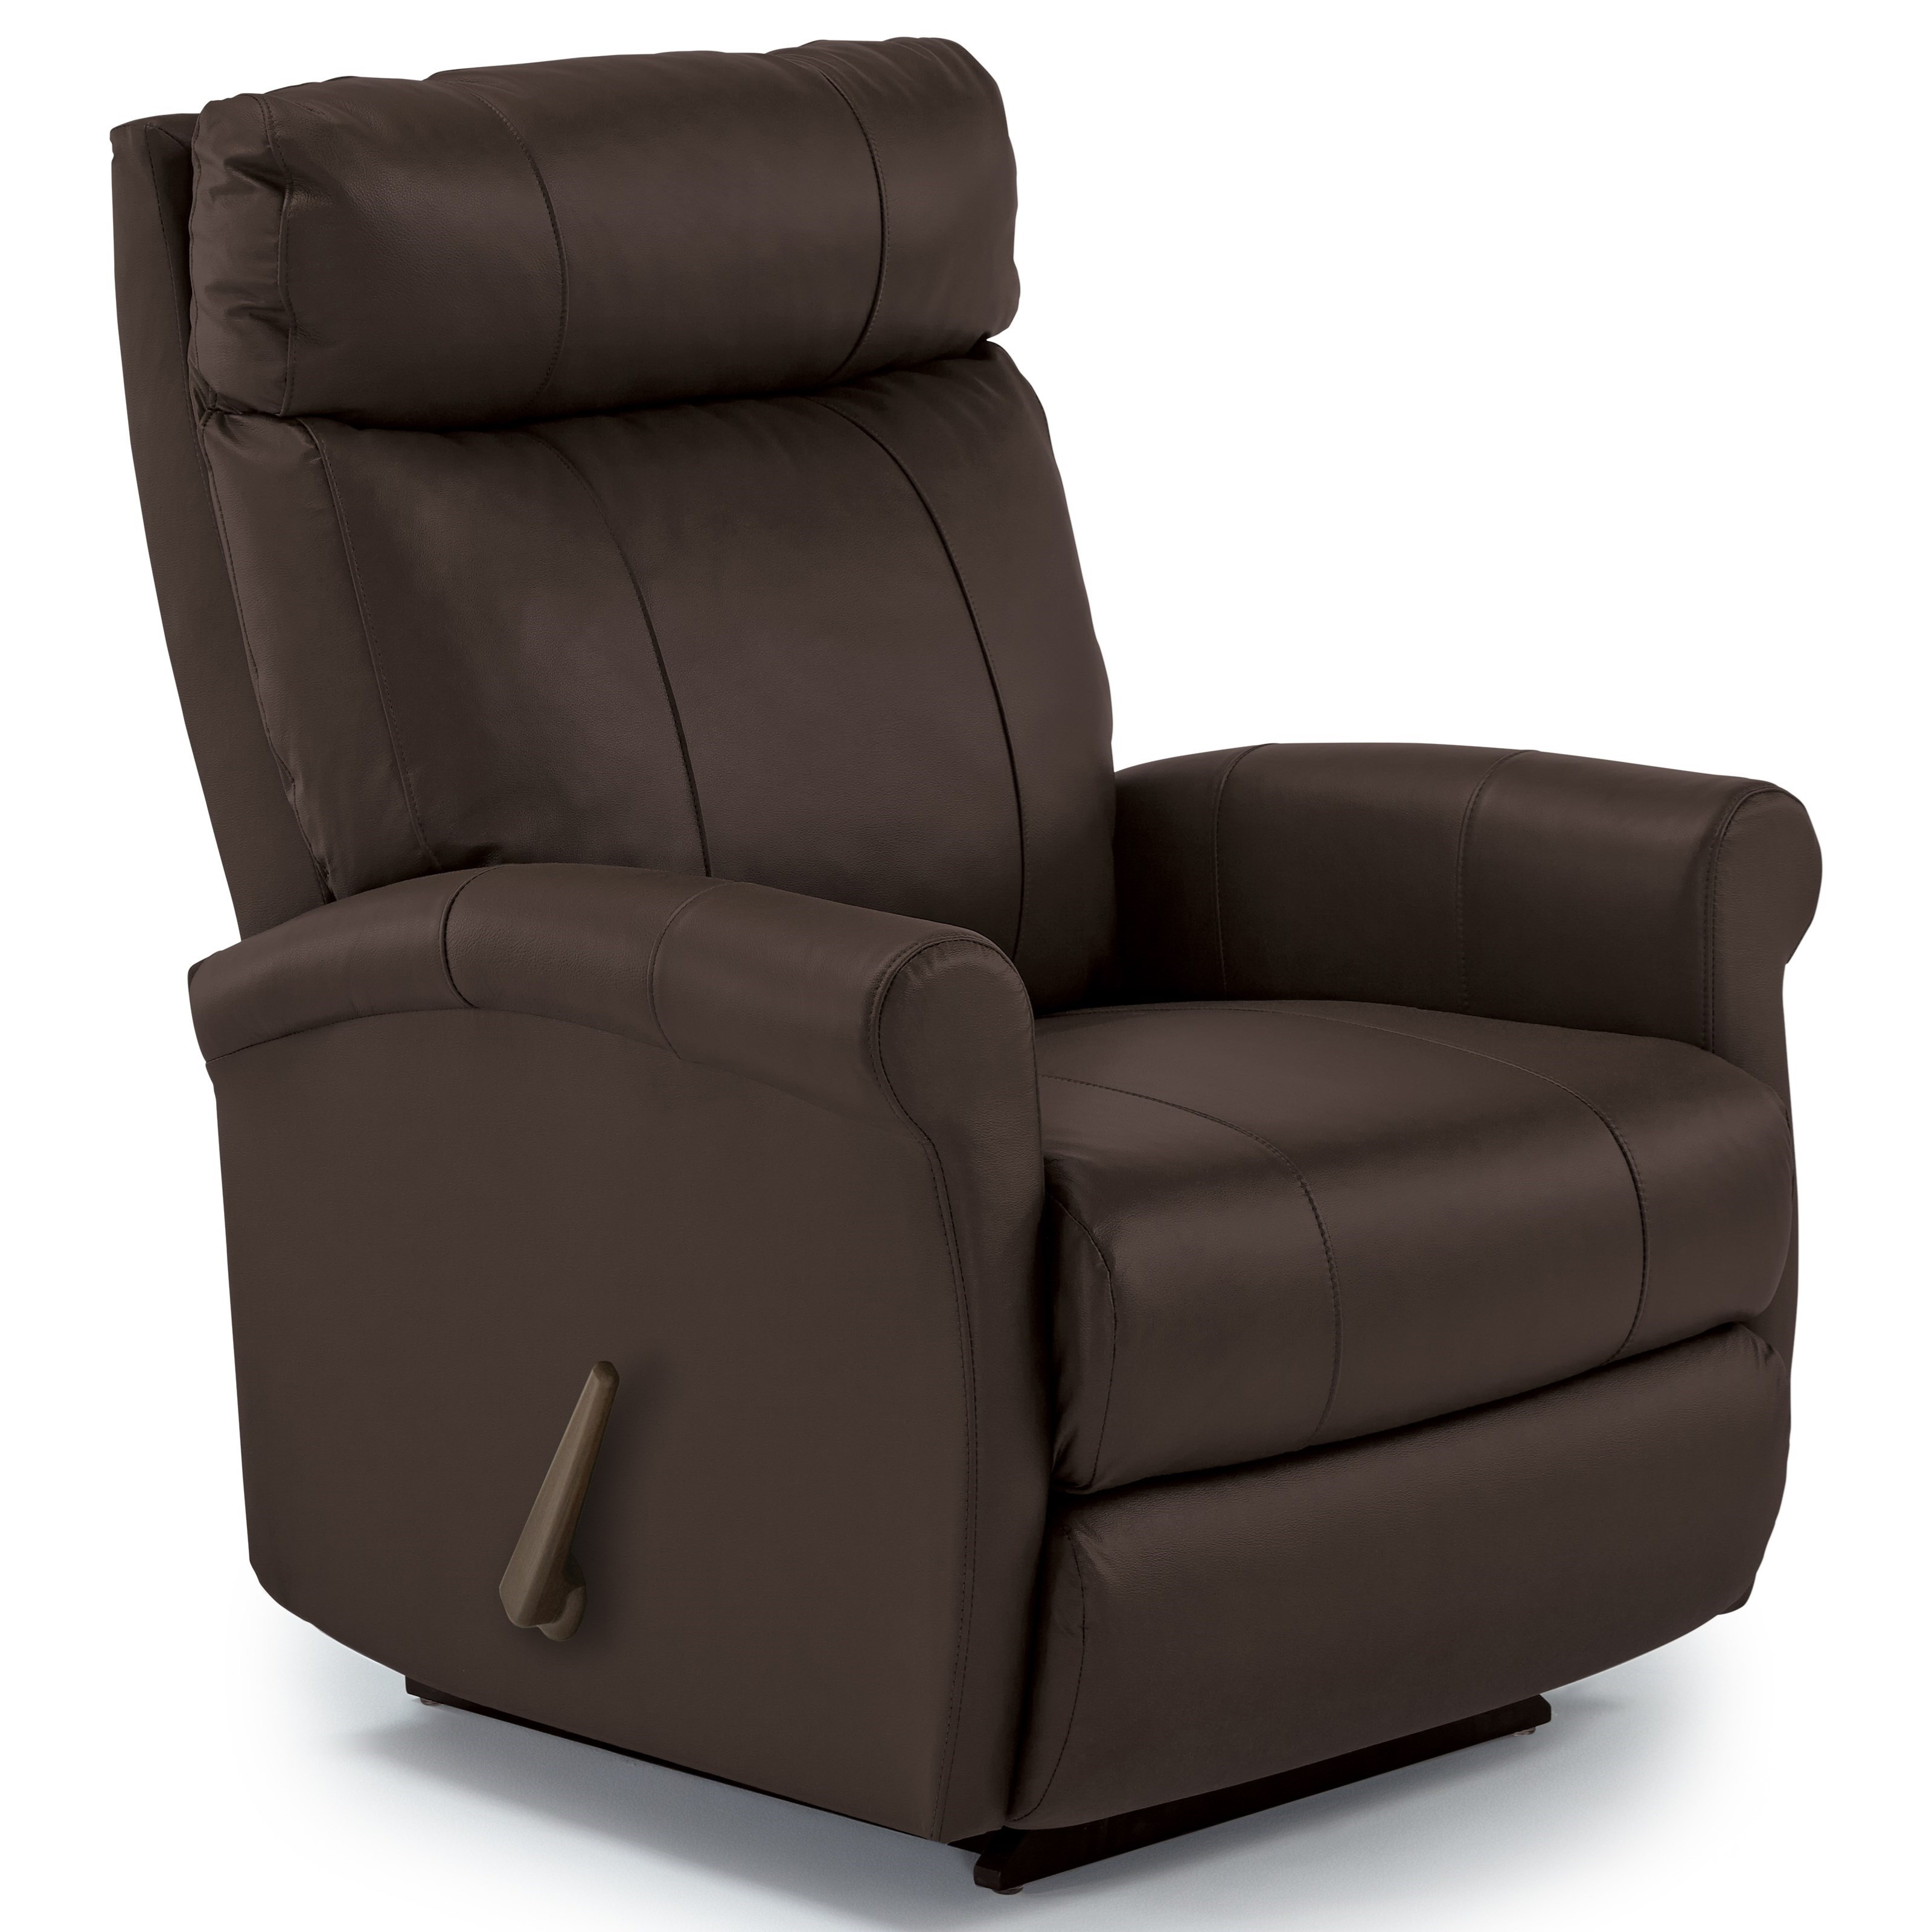 Codie Power Tilt Headrest Space Saver Recliner by Best Home Furnishings at Saugerties Furniture Mart